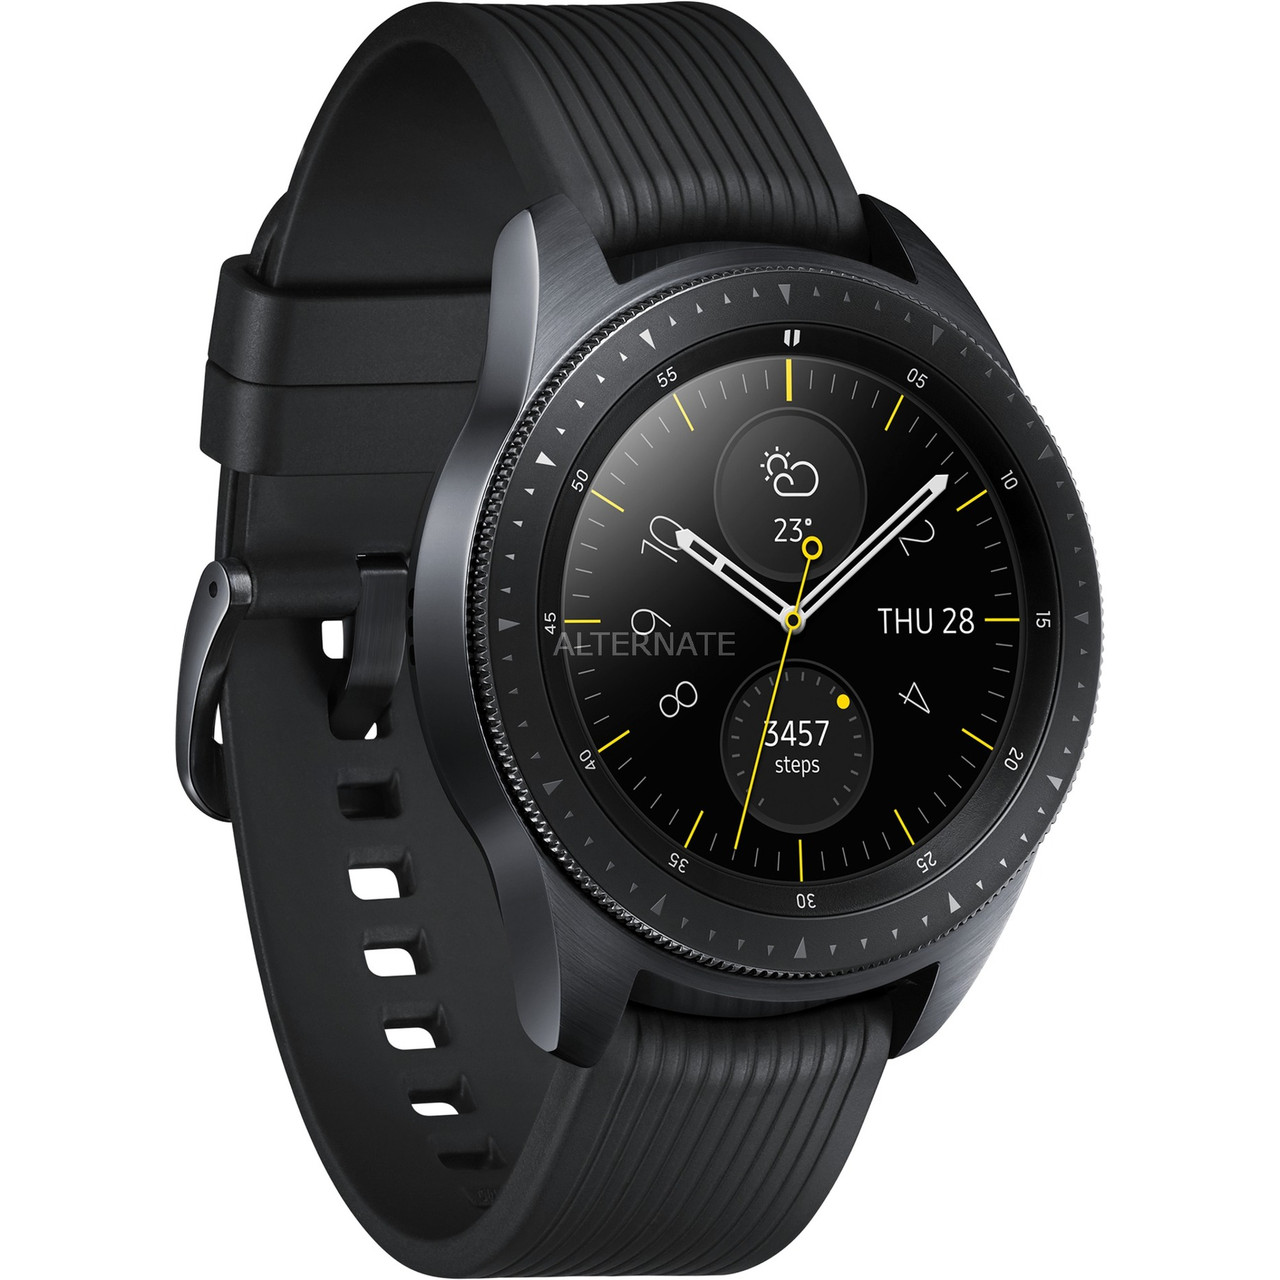 Смарт-часы Samsung Galaxy Watch 42mm LTE Midnight Black (SM-R810NZKA), фото 1